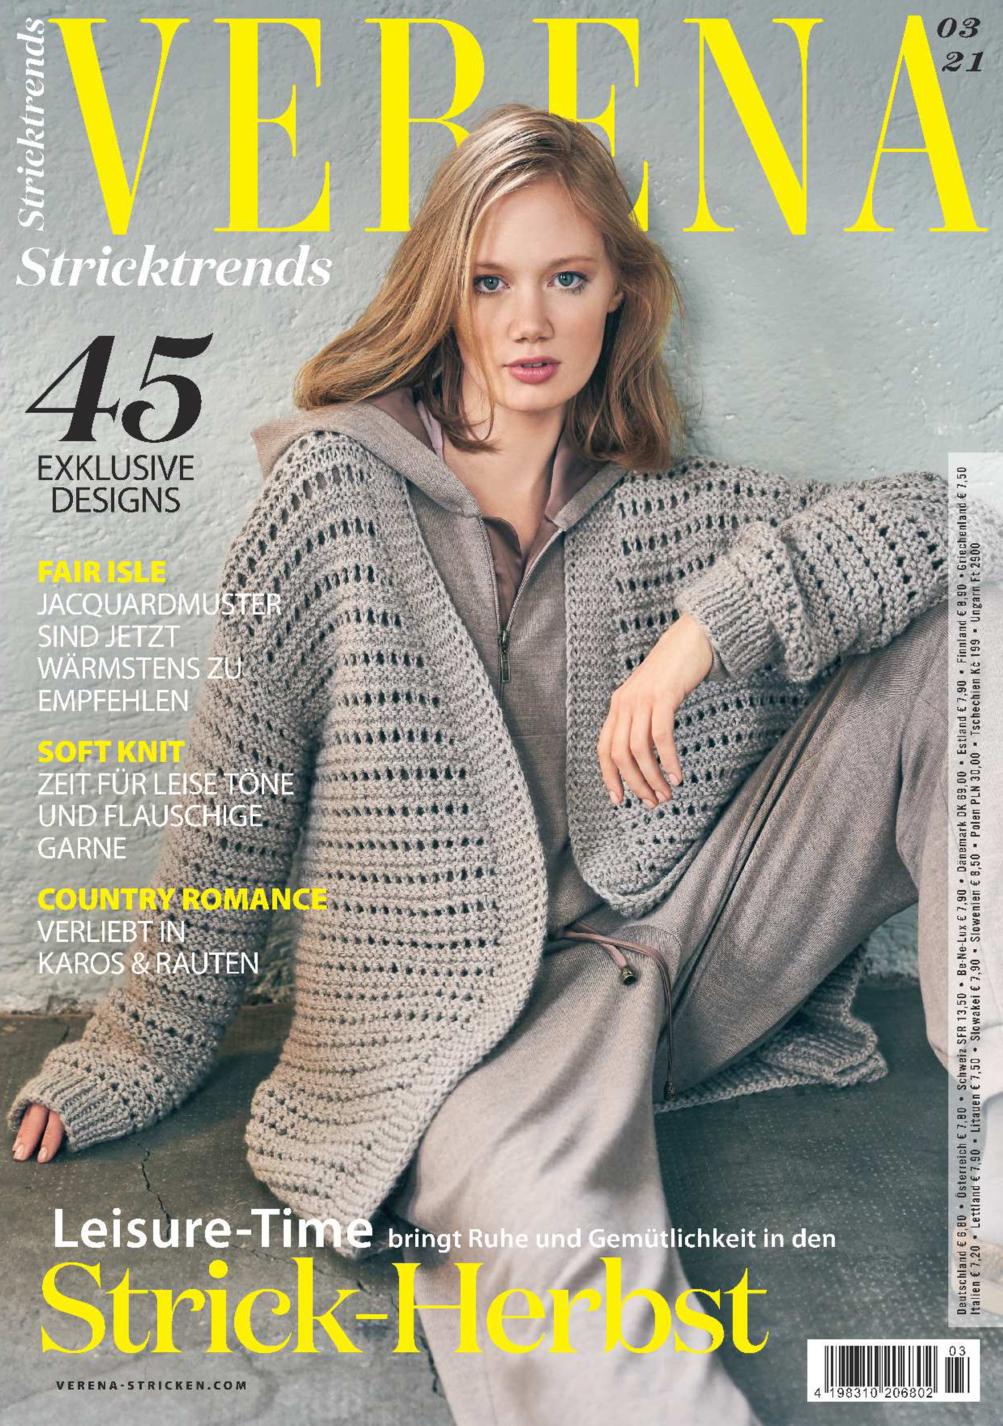 Verena Stricktrends 03/2021 - Strick-Herbst